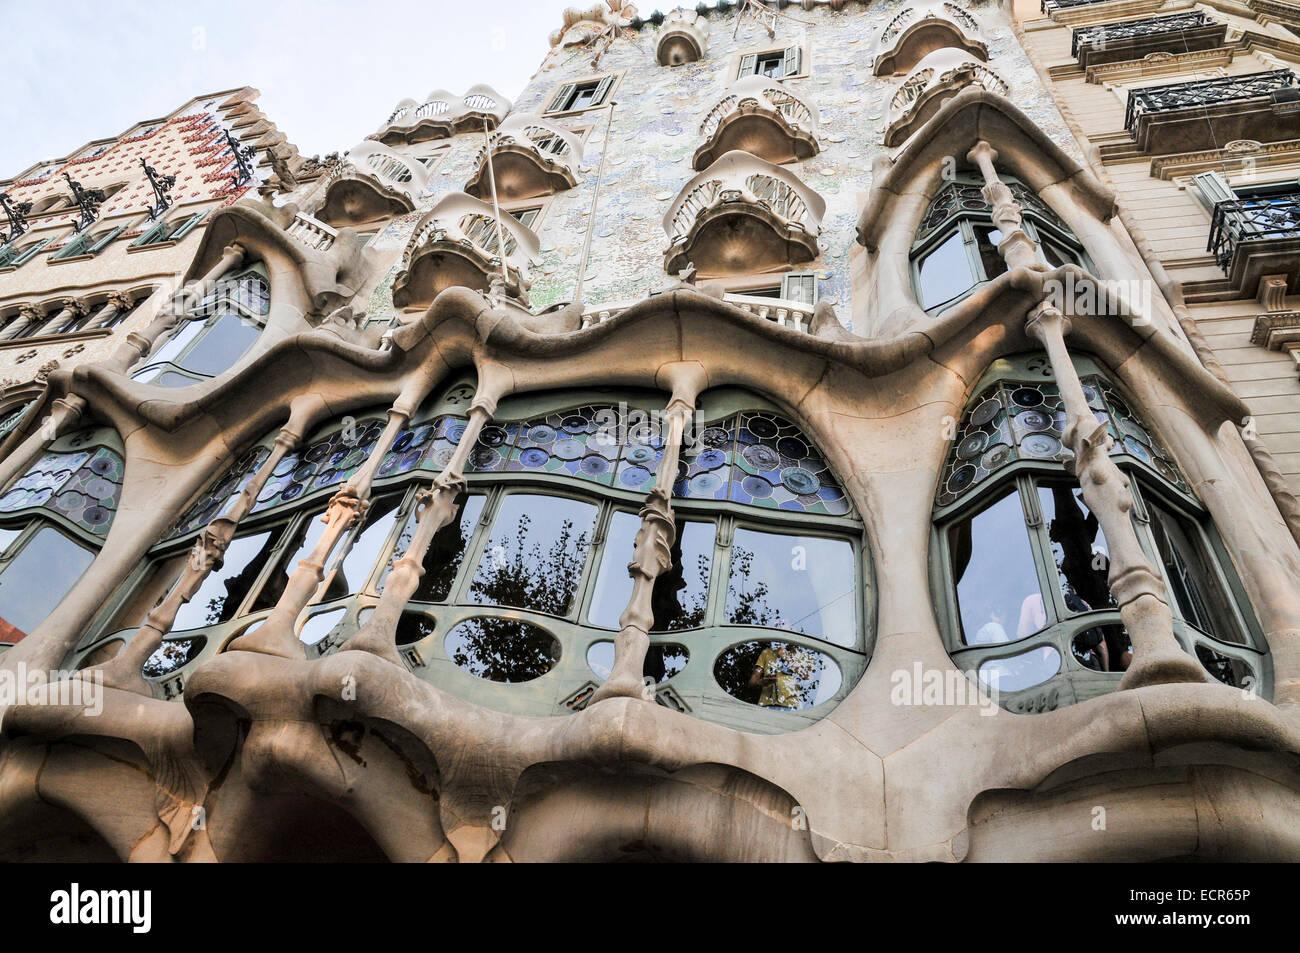 Spanien, Barcelona, Casa Mila (La Pedrera) von dem Architekten Antoni Gaudi Stockbild